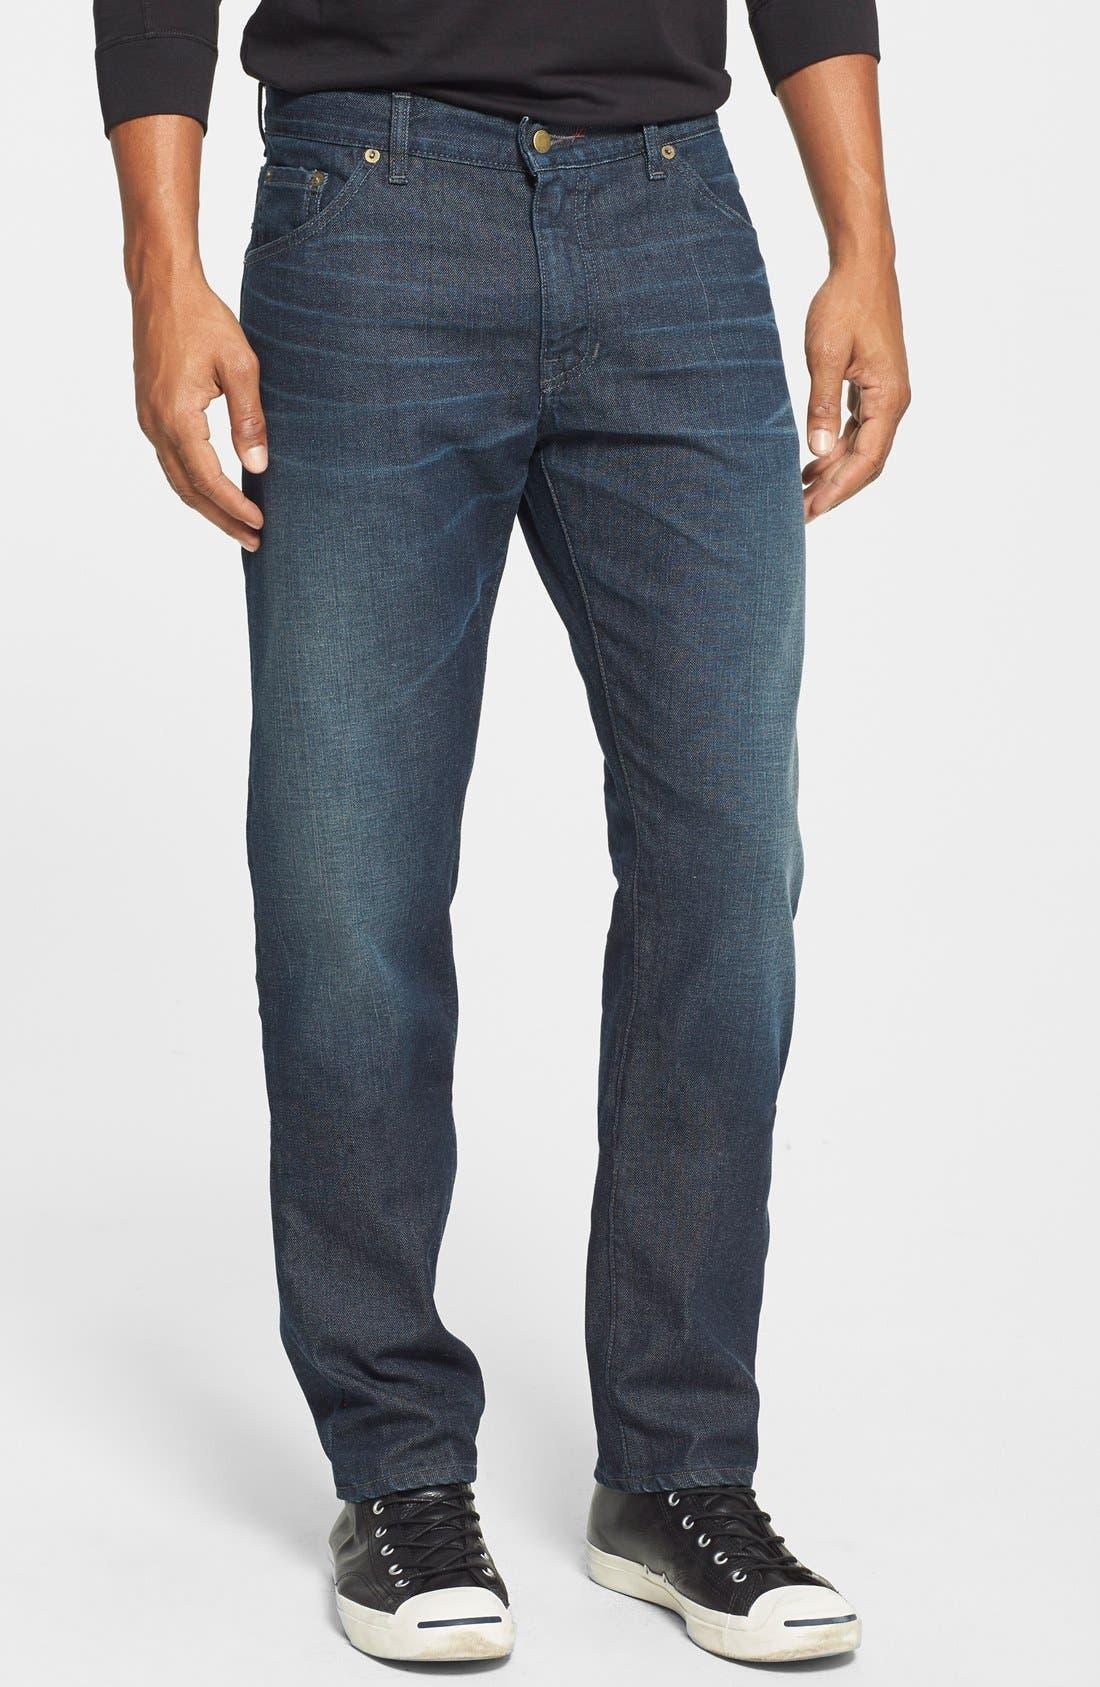 RALEIGH DENIM 'Martin' Slim Fit Jeans in Mason